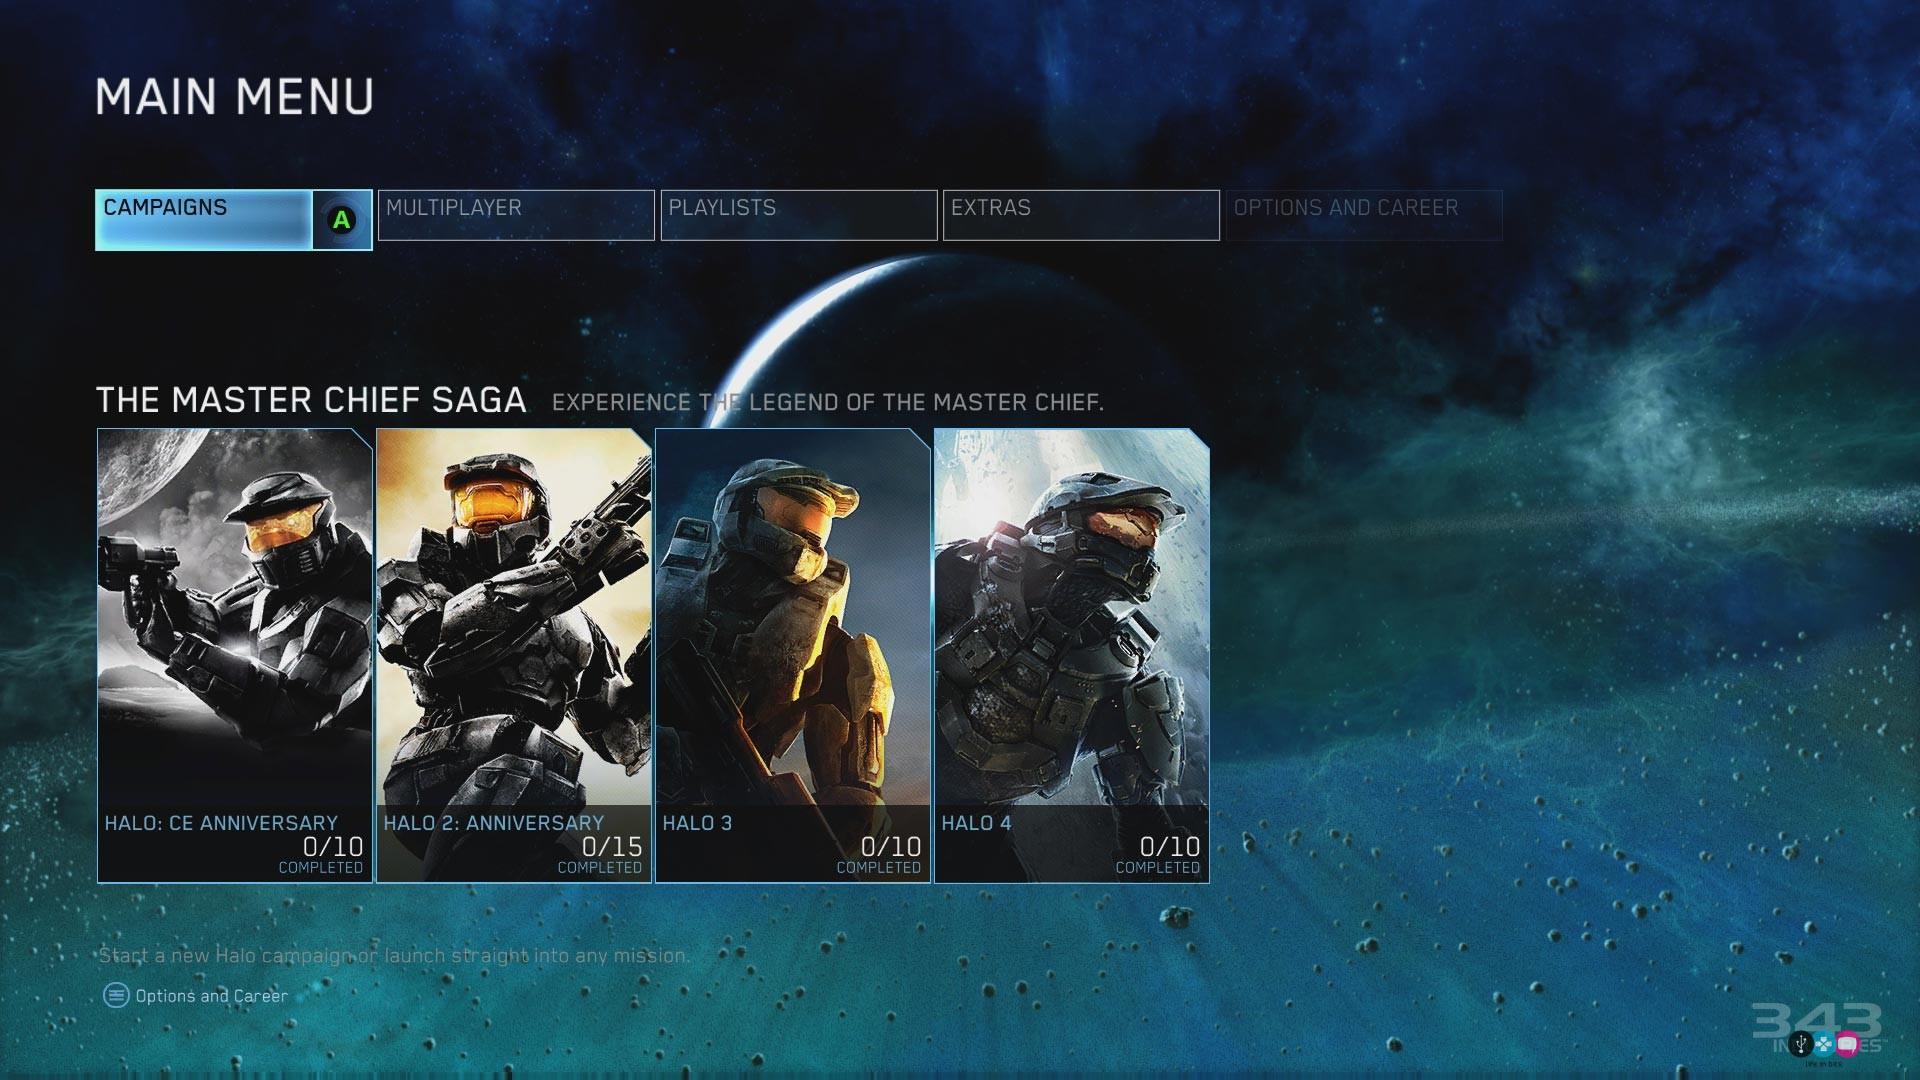 Halo mcc matchmaking times